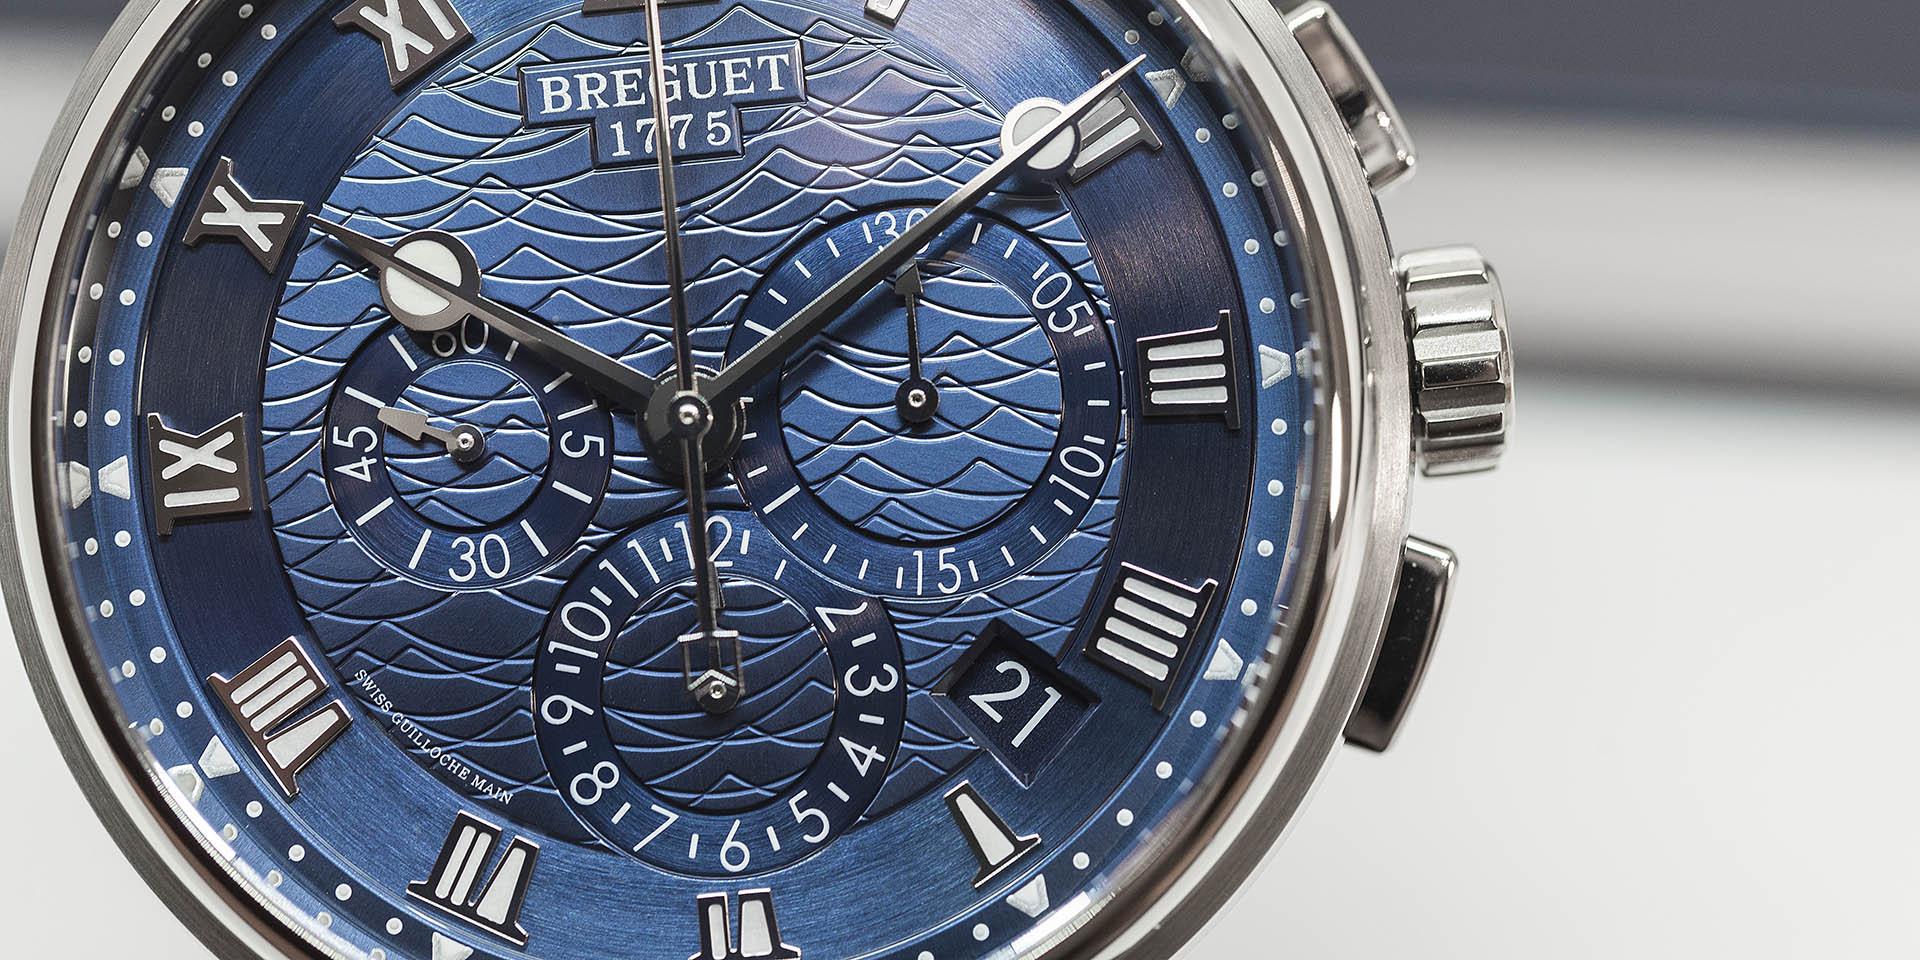 5527-breguet-marine-chronograph-3.jpg